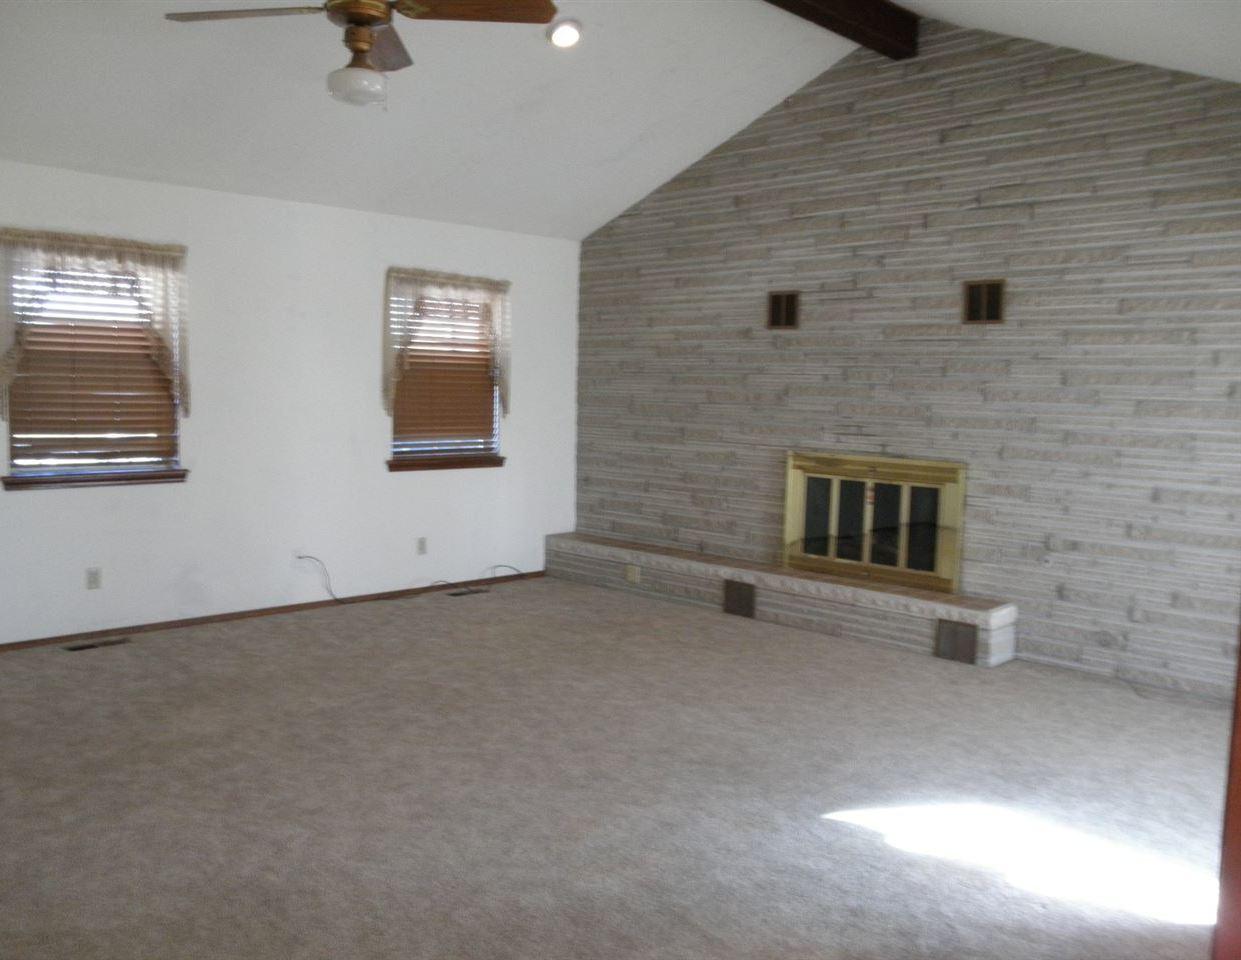 Sold Cross Sale W/ MLS | 2516 Oriole  Ponca City, OK 74601 2